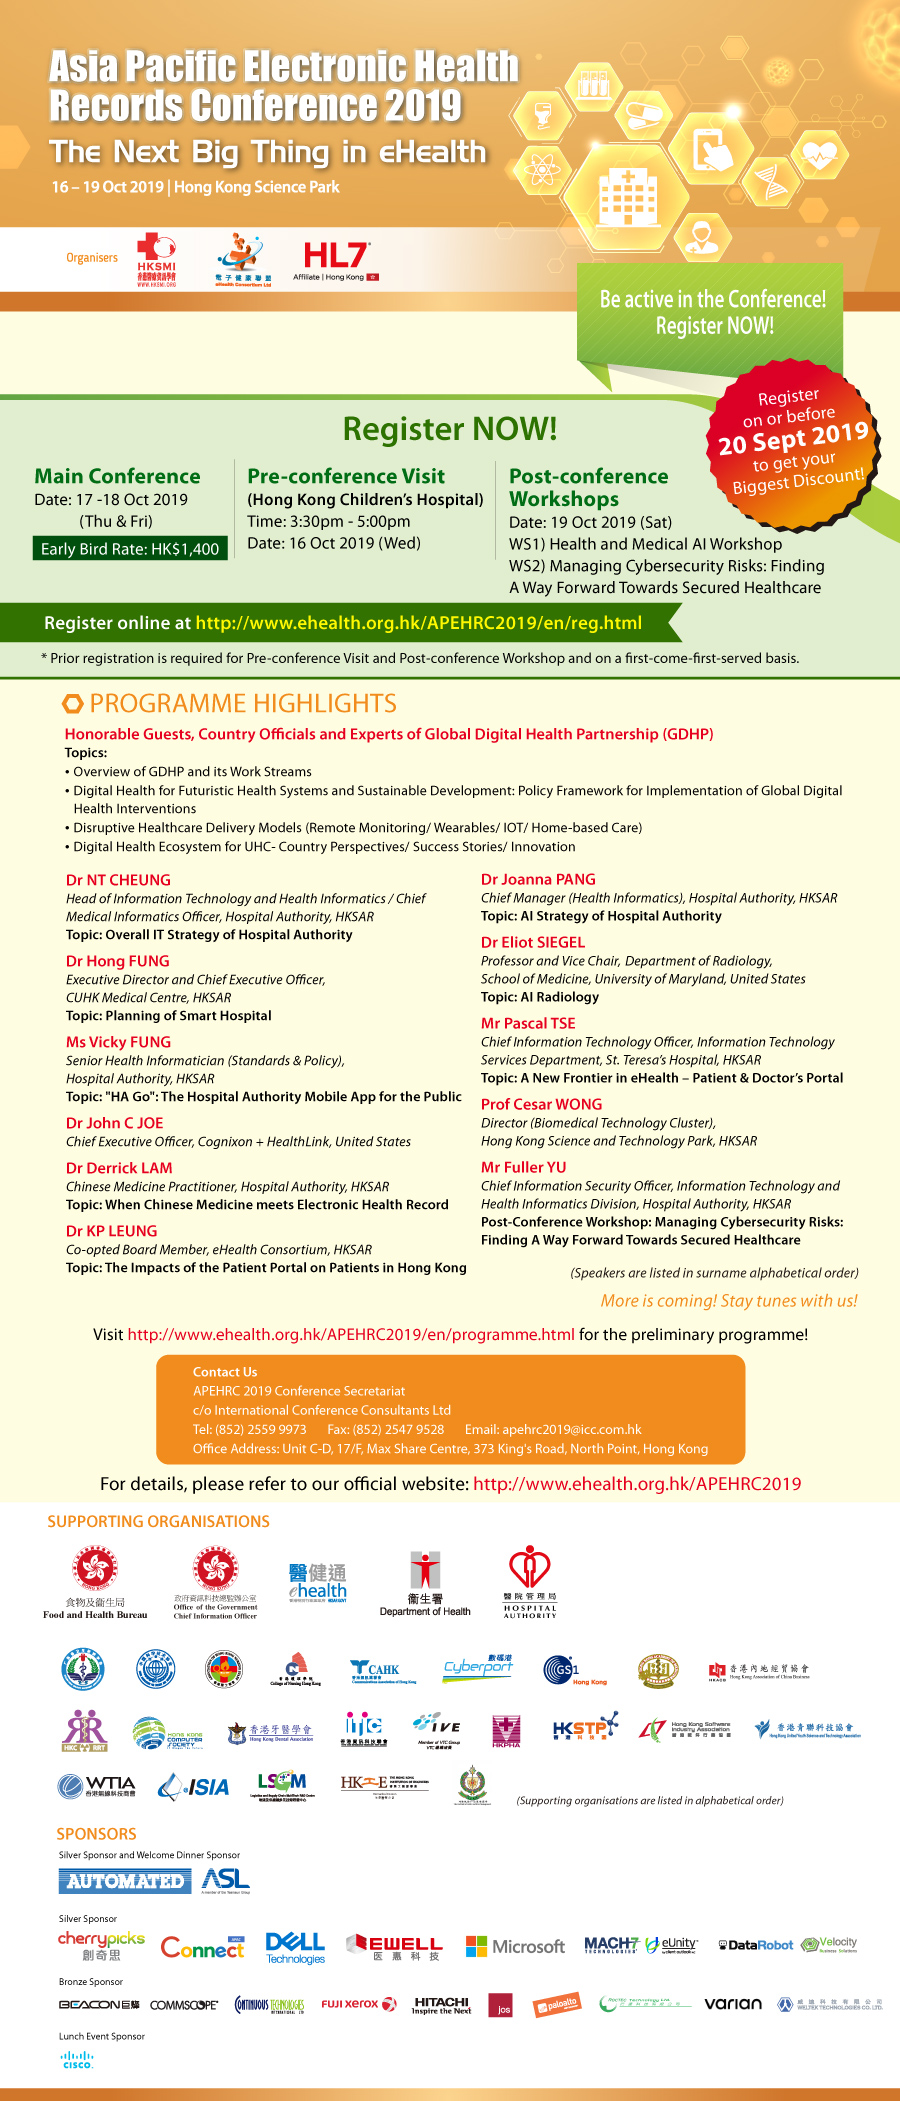 Stanford Medicine Symposium - Novel Strategies for Treatment of Neurologic Disorders